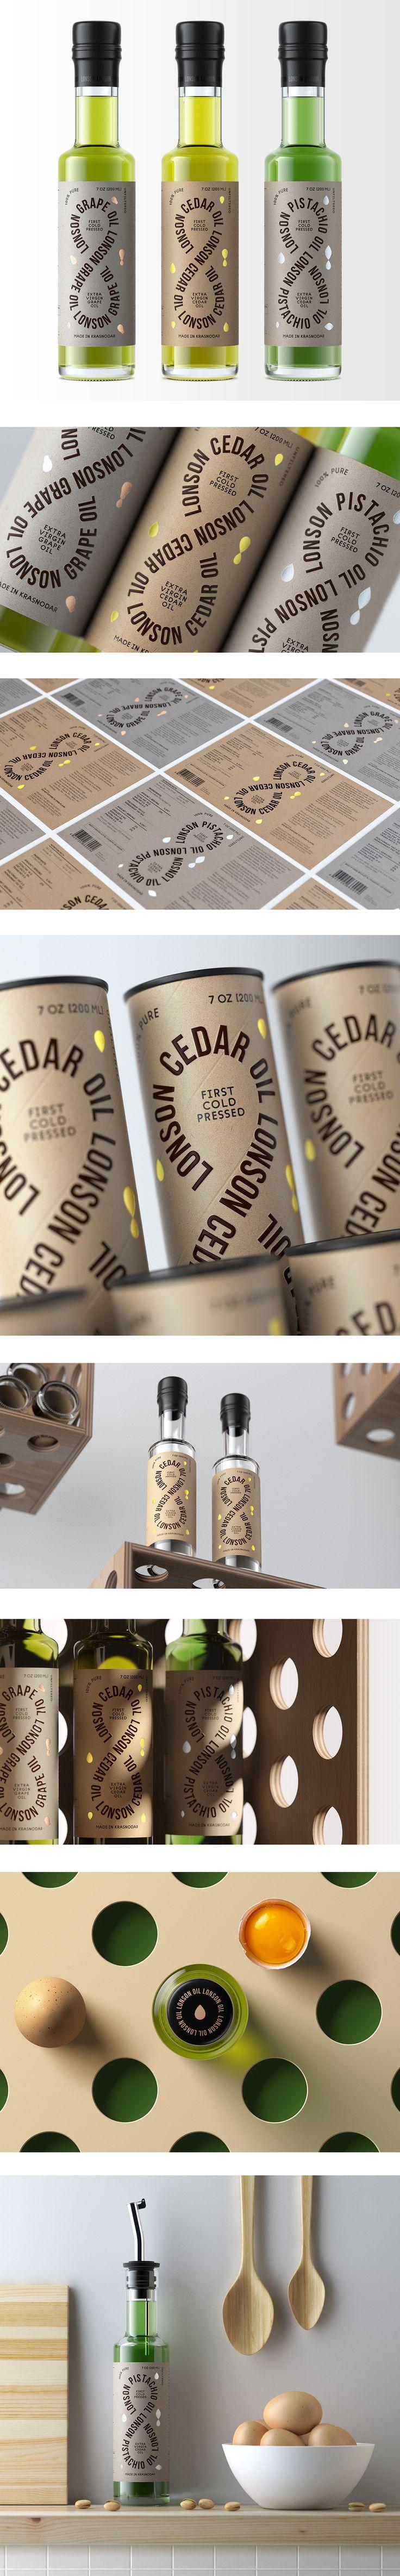 Lonson Oil, Упаковка © ДанилДа